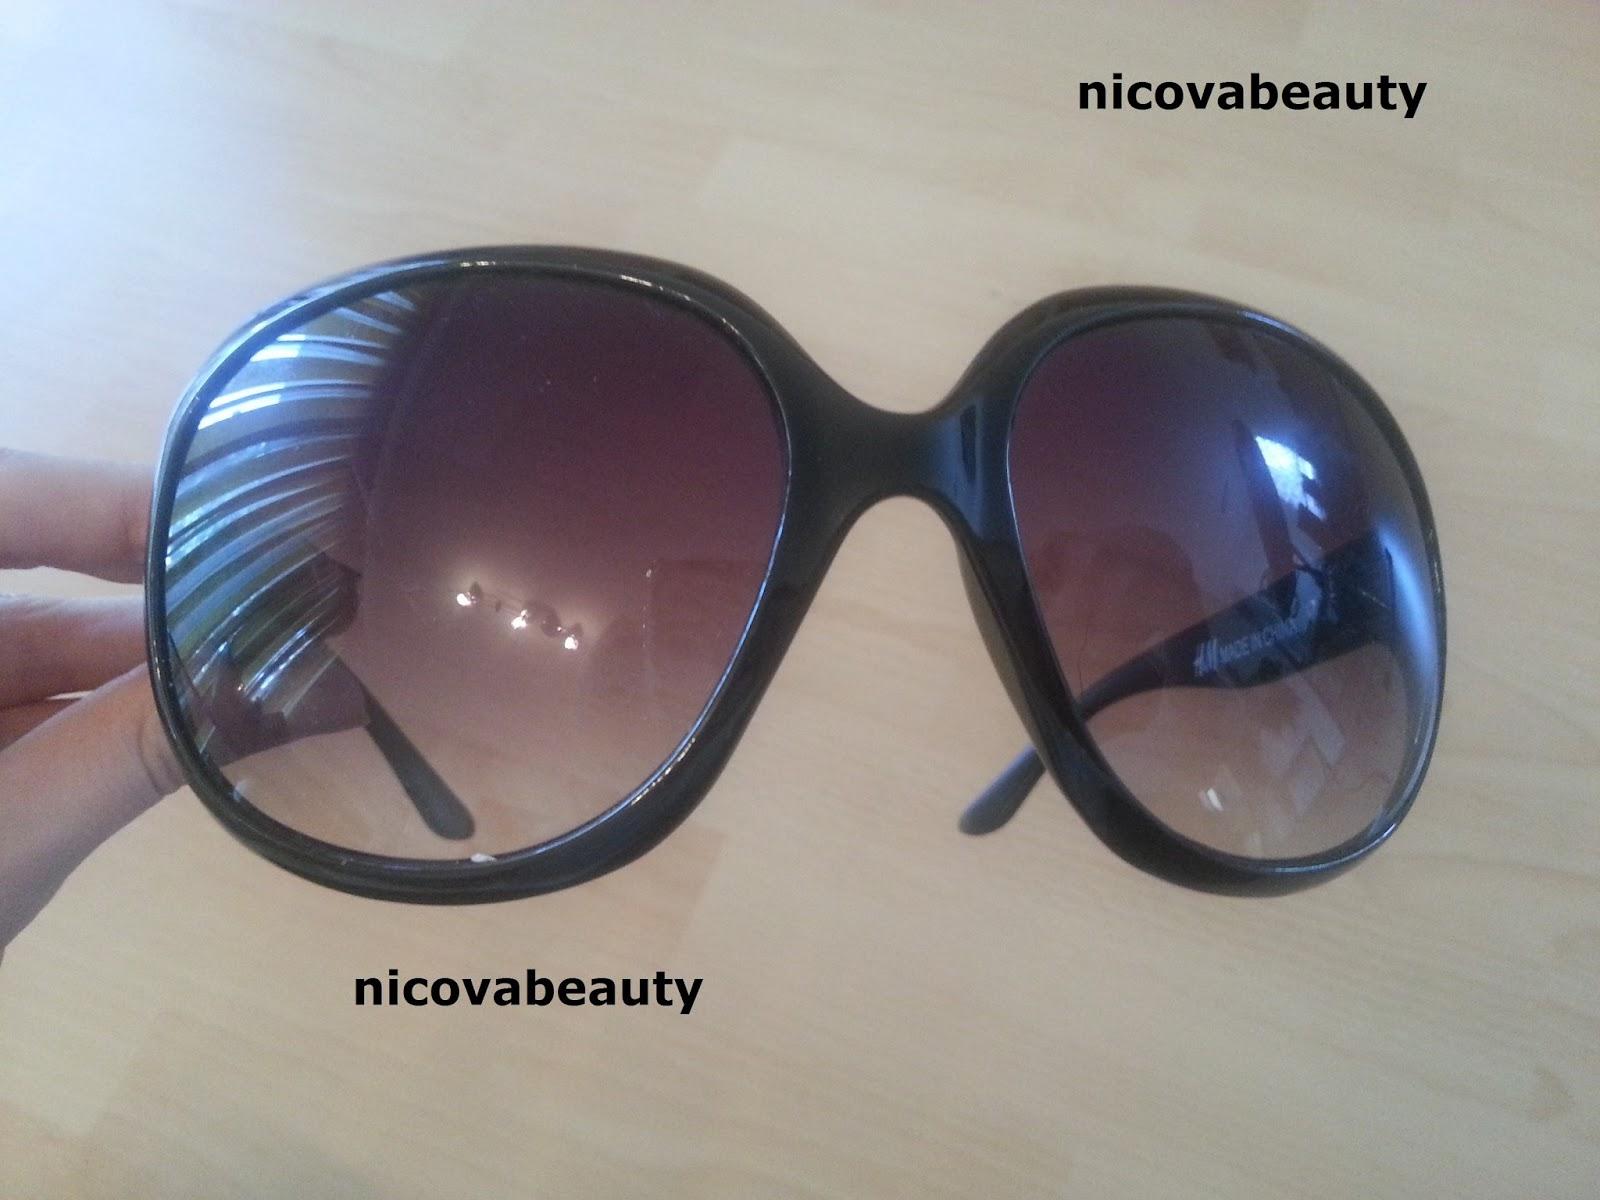 nicovabeauty heidi klum sonnenbrille aus germany 39 s next topmodel 2013 heidi klum sunglasses. Black Bedroom Furniture Sets. Home Design Ideas